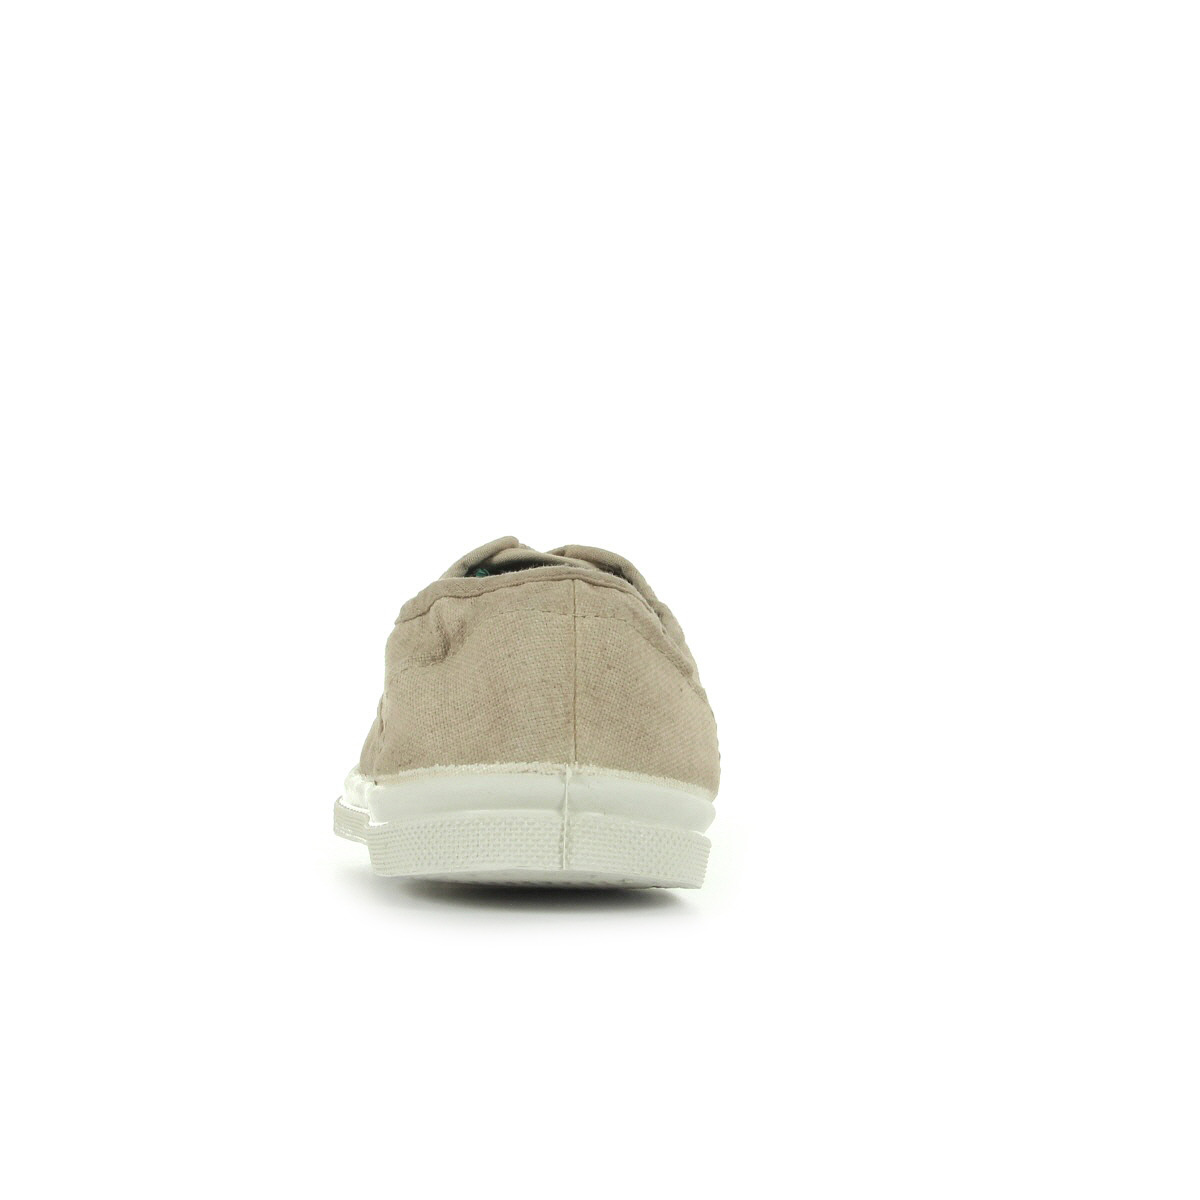 Bensimon Tennis Lacet Coquille H15004C155105, Baskets mode homme